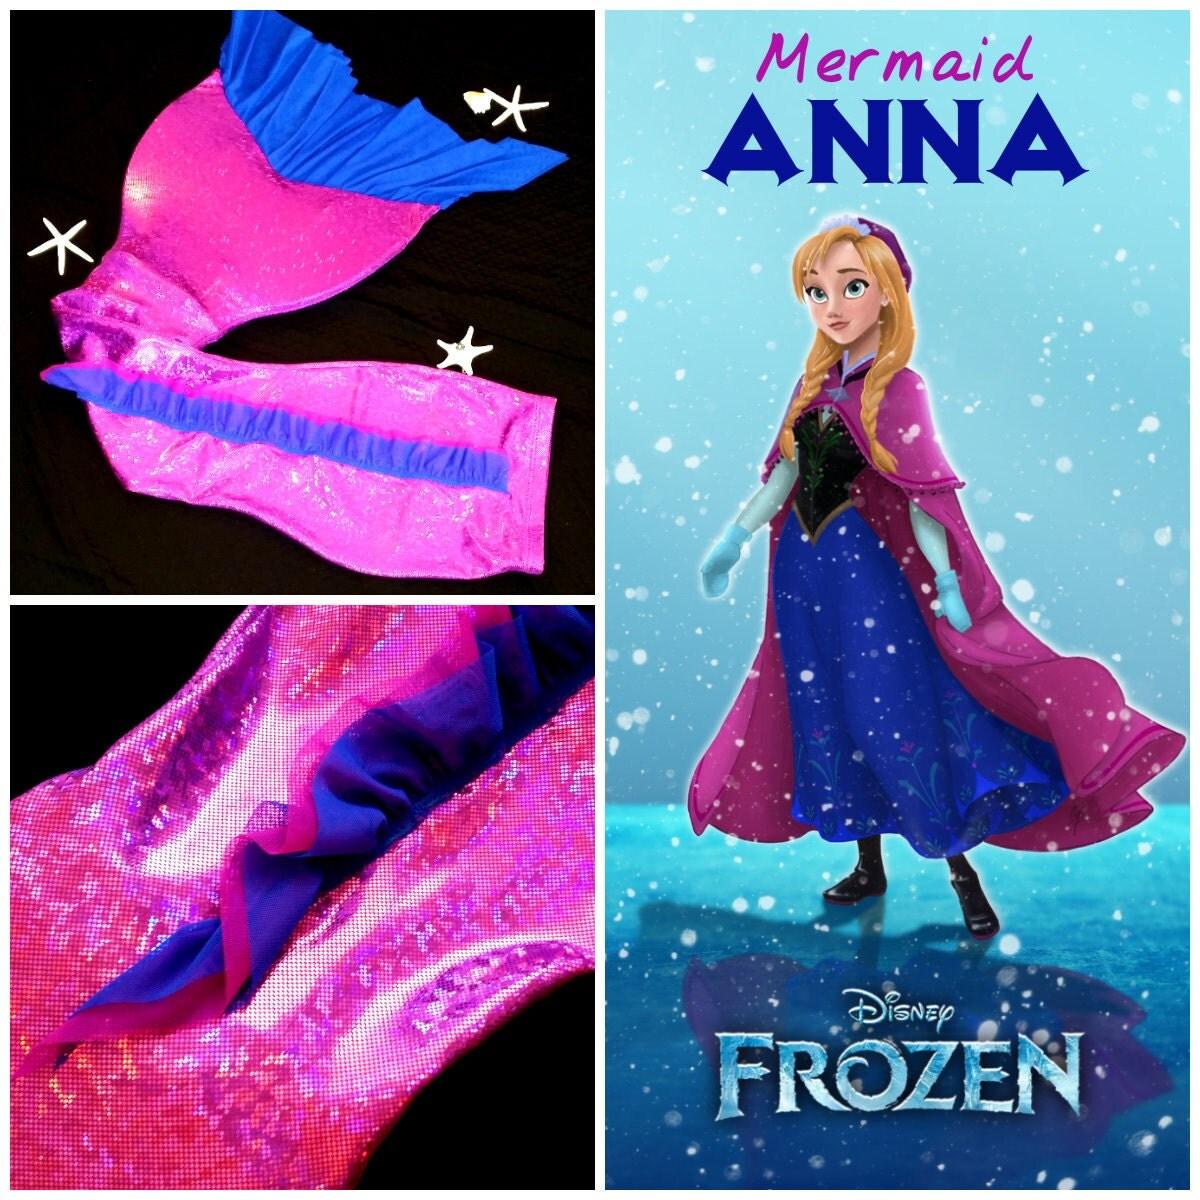 Mermaid ANNA Inspire By Frozen Swimmable Mermaid